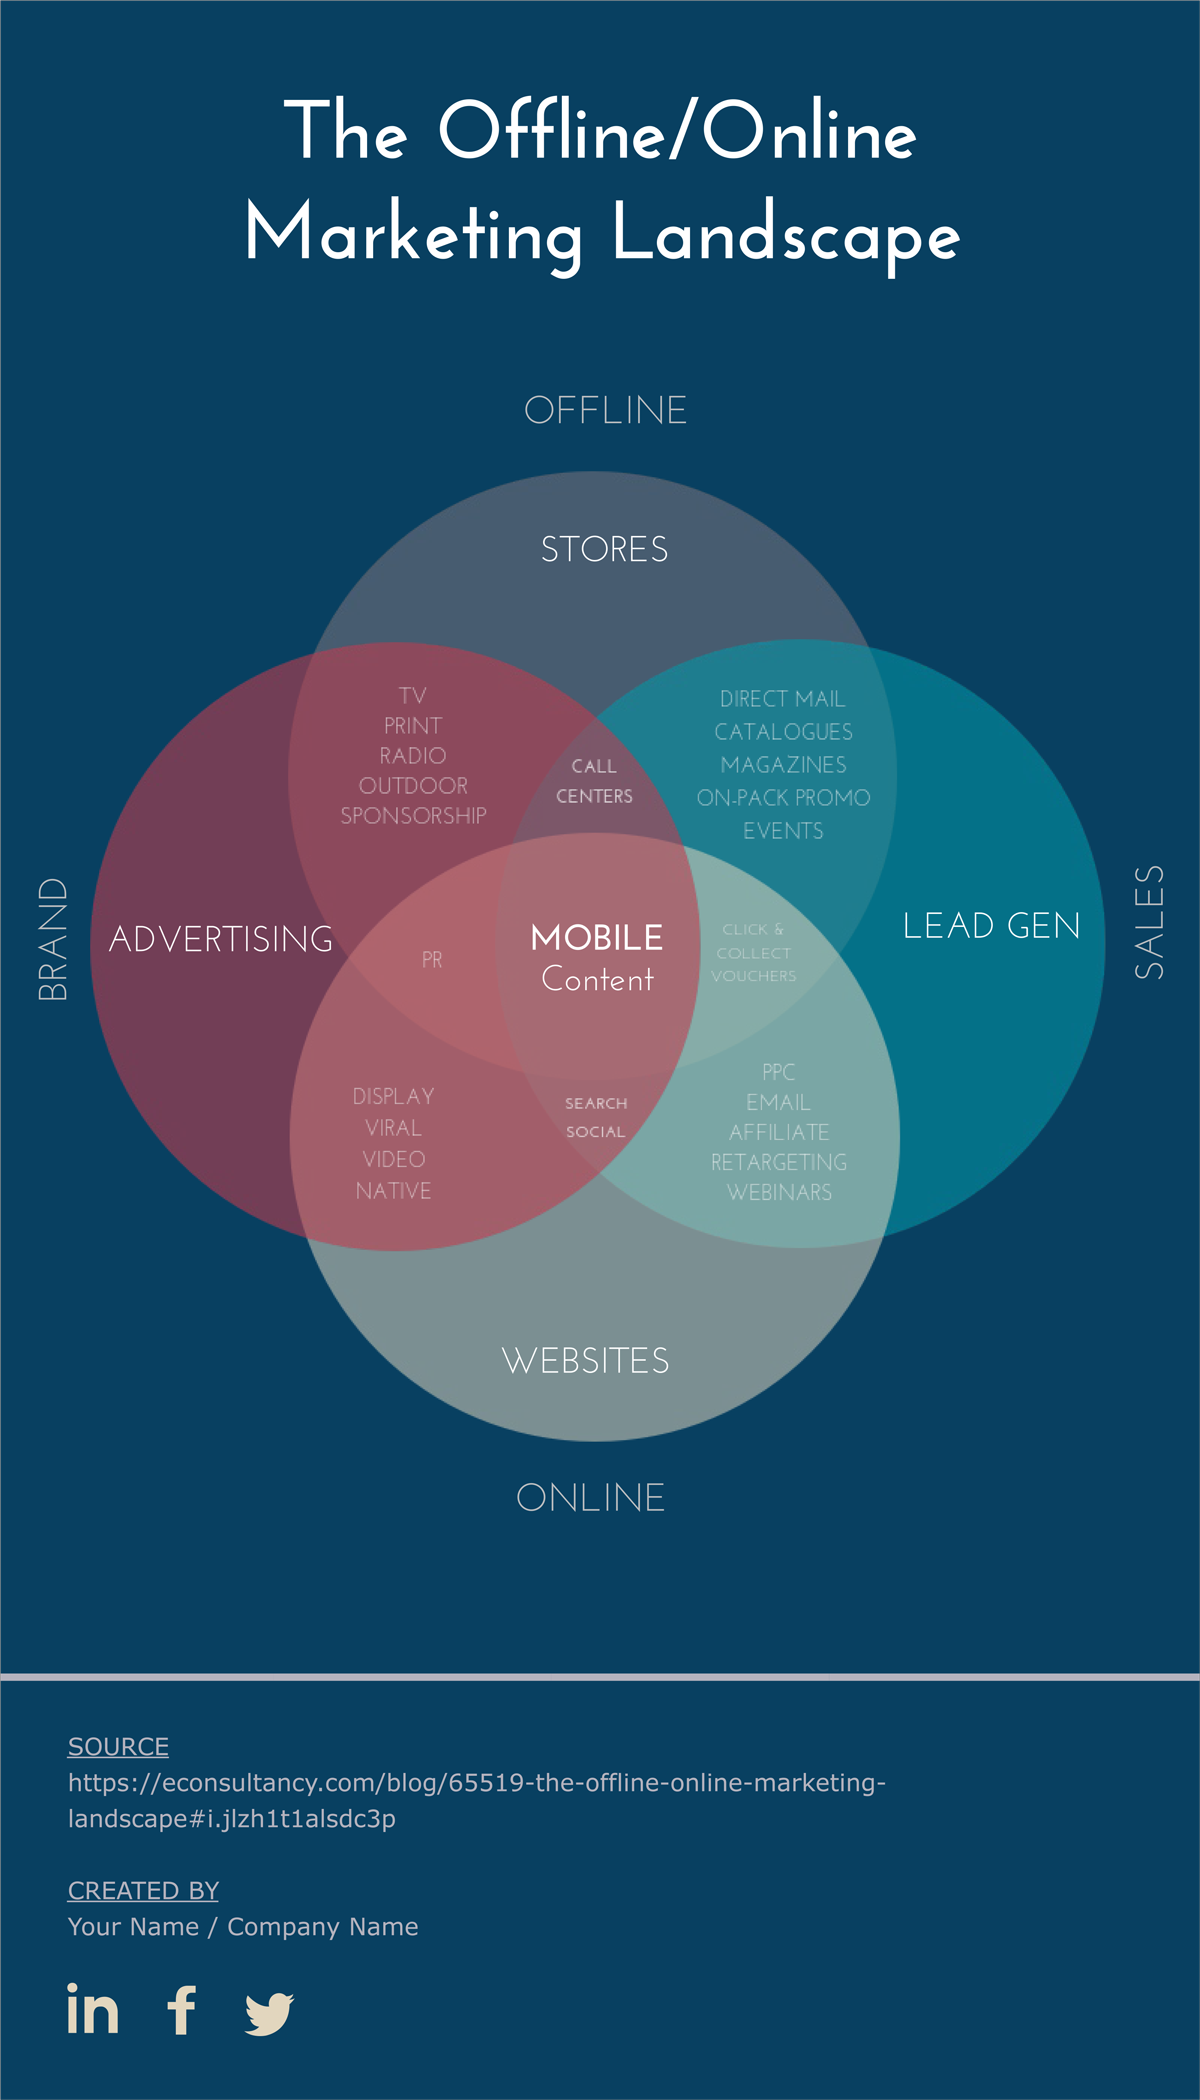 Marketing online and offline venn diagram | Marketing Group Board ...